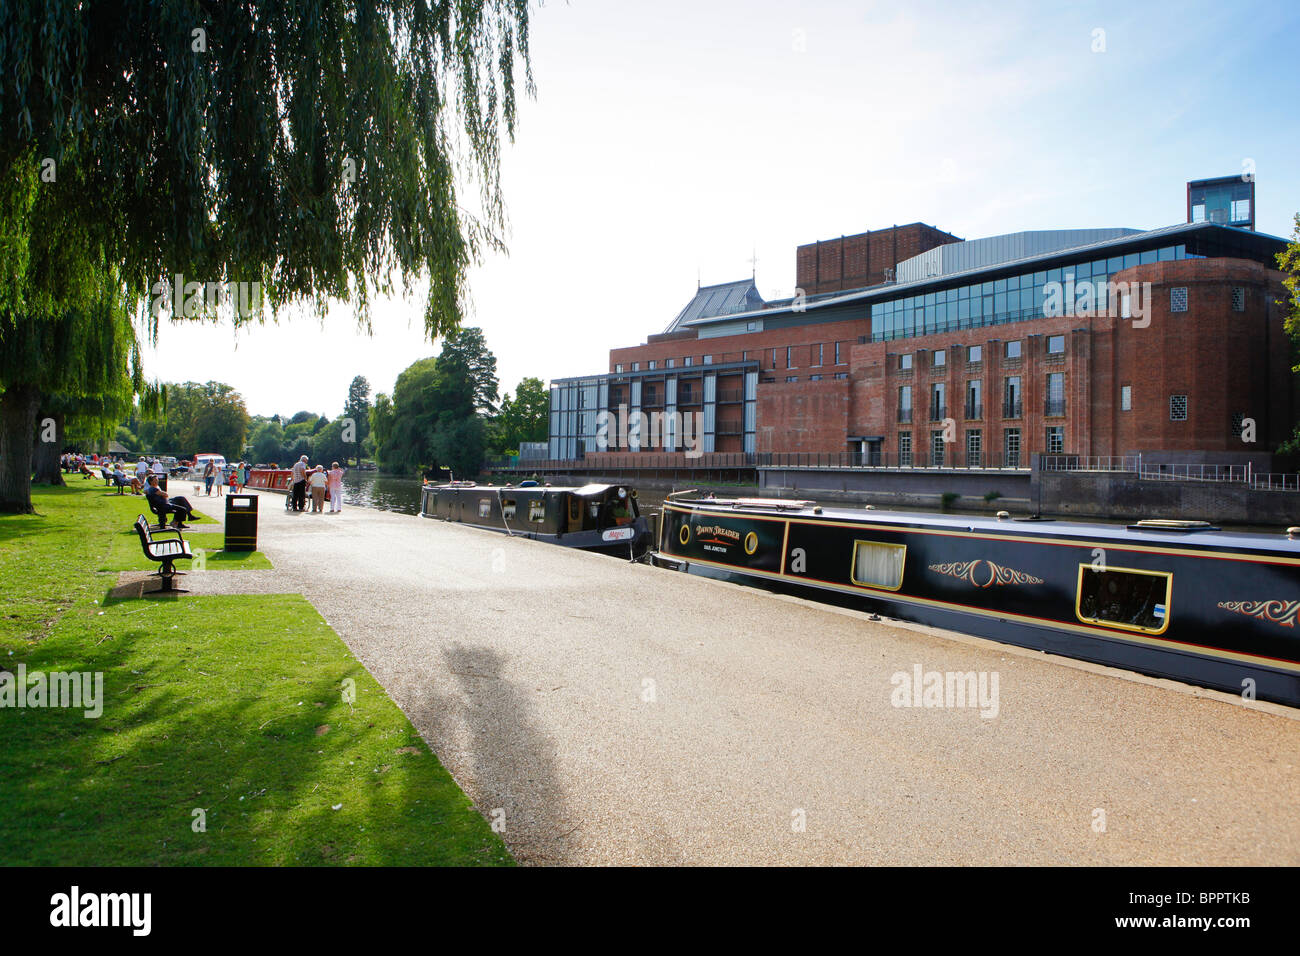 Stratford-upon-Avon. River scene. Royal Shakespeare Theatre - Stock Image